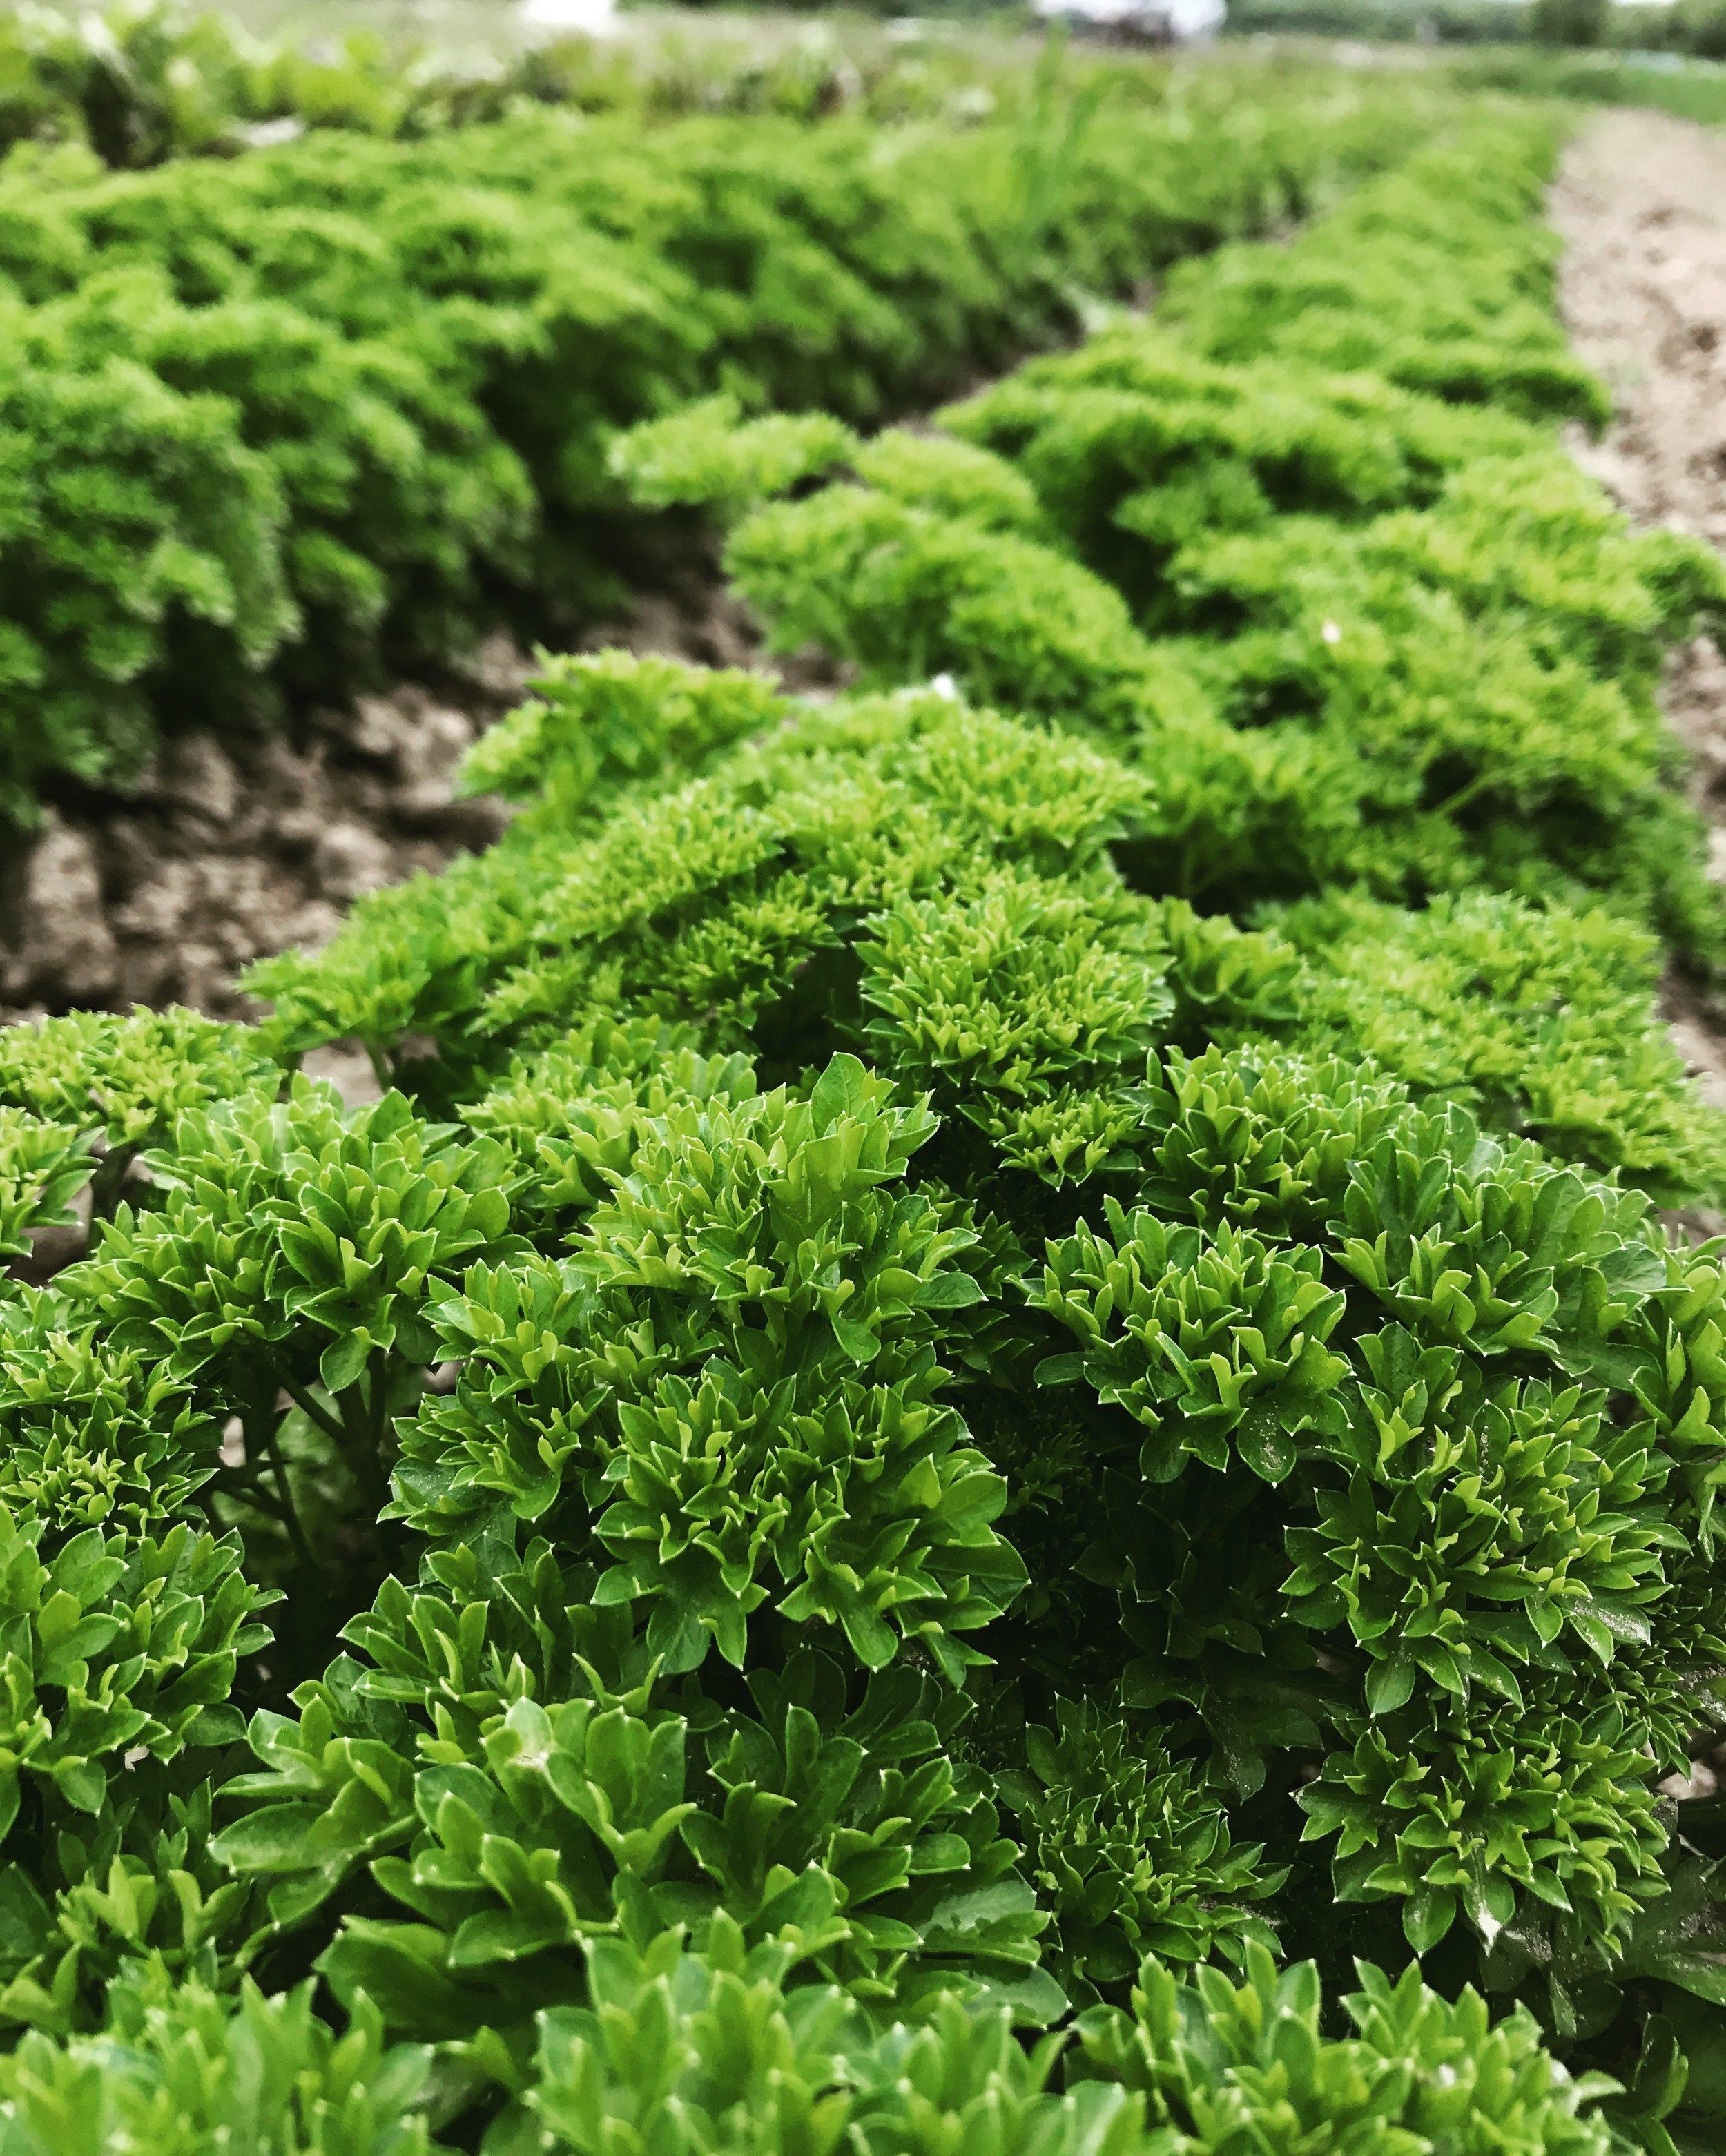 localorganicherbfarmburlingtonvermontpitchforkfarm.jpg